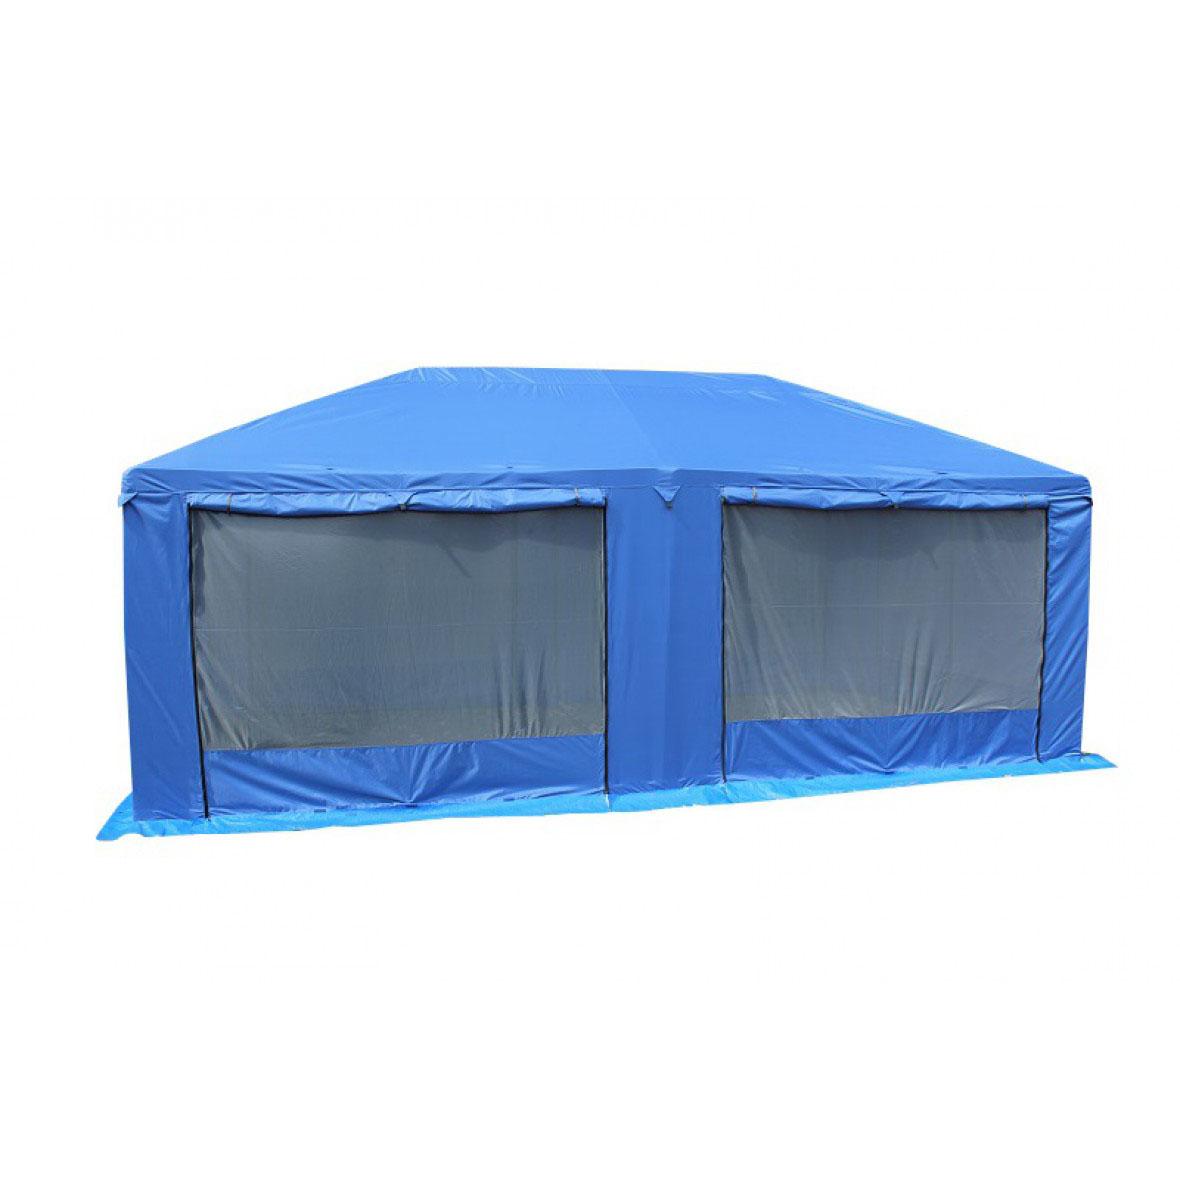 Шатер Митек Пикник 5.0х2.5 (каркас Люкс) синий